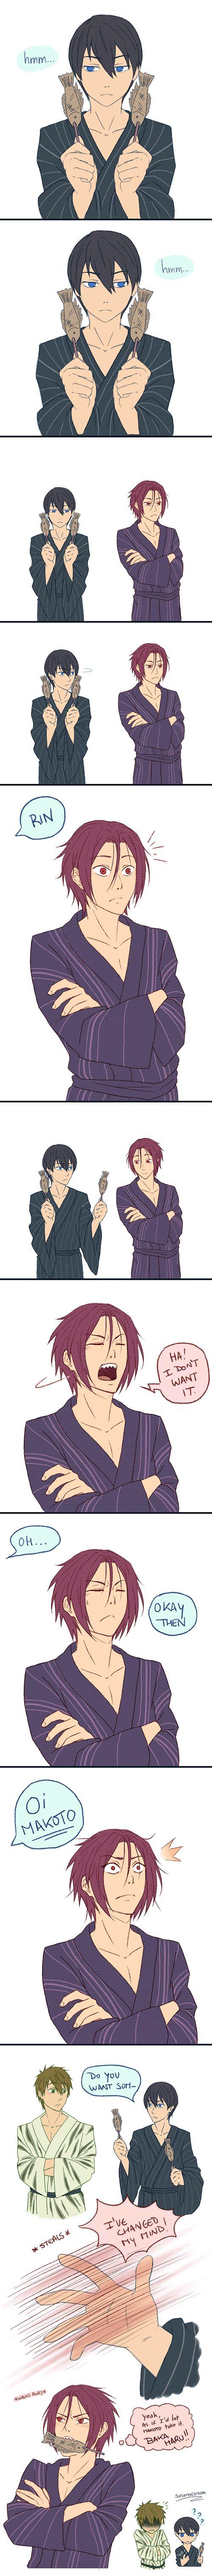 RinHaru + Shioyaki (Mini-Comic) by *SorceressDream on deviantART